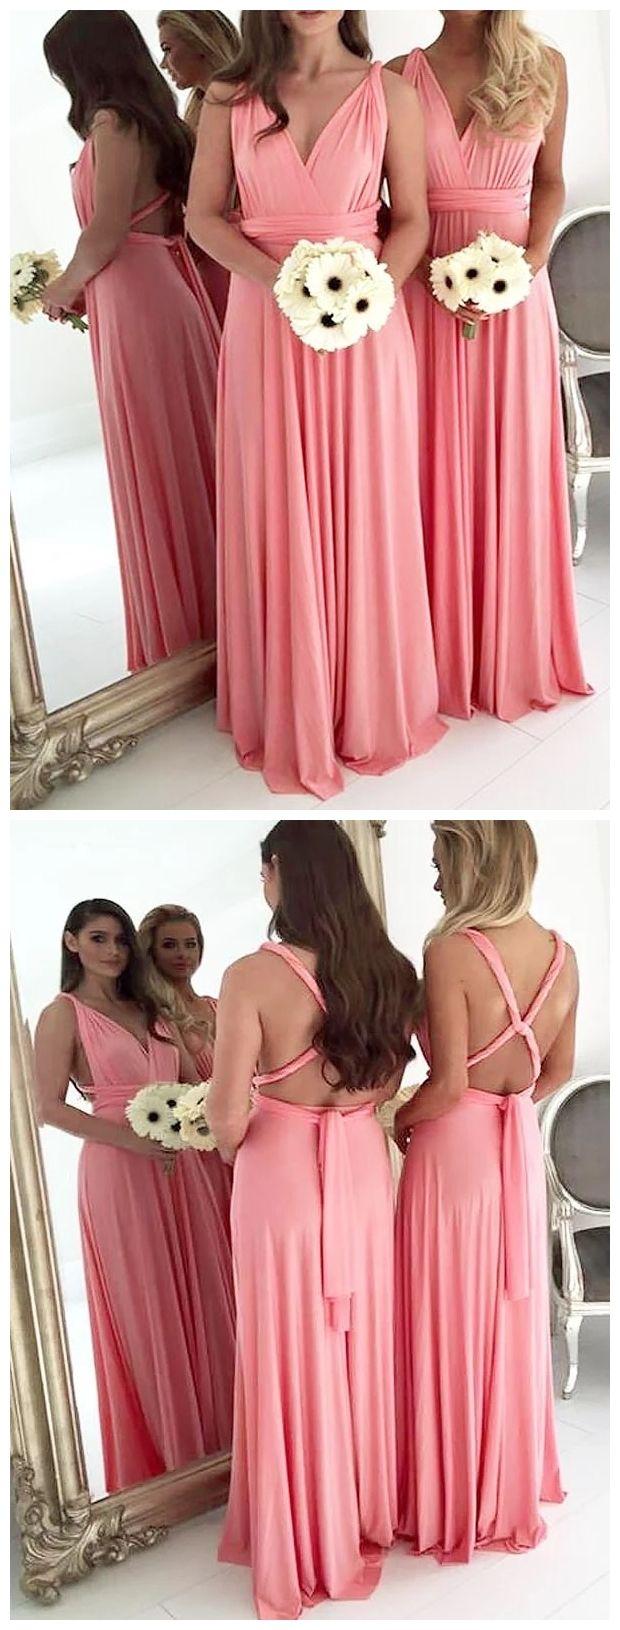 Long chiffon plus size bridesmaid dresses backless light coral